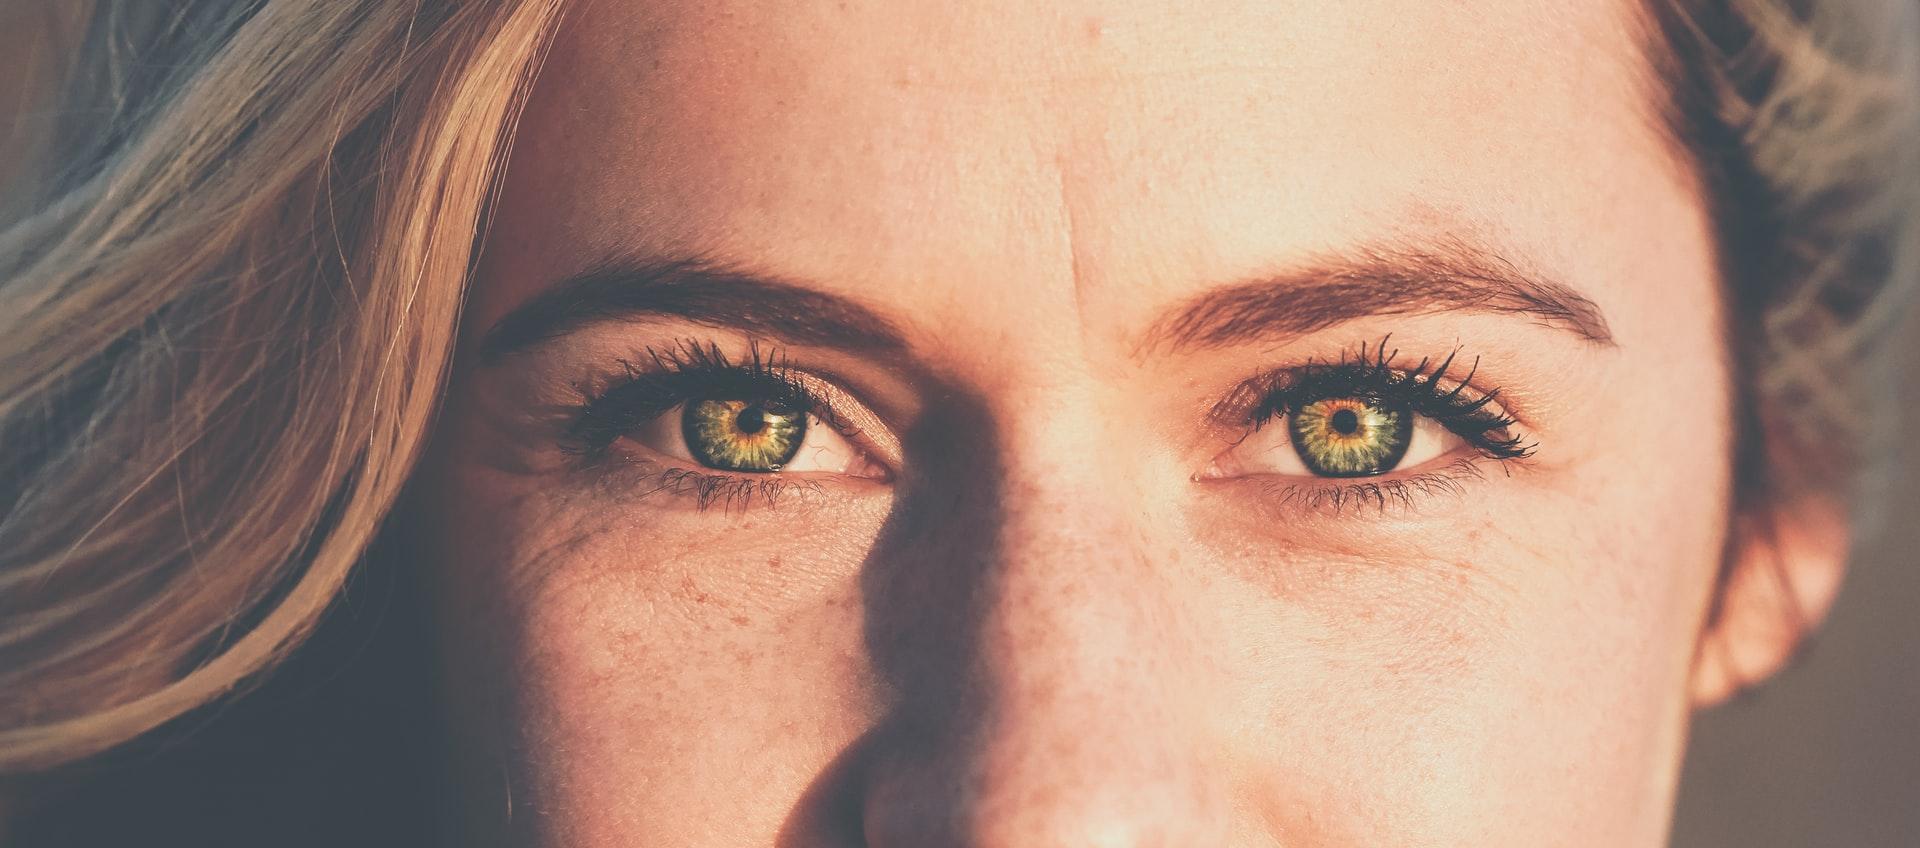 opiniones-reales-operacion-miopia